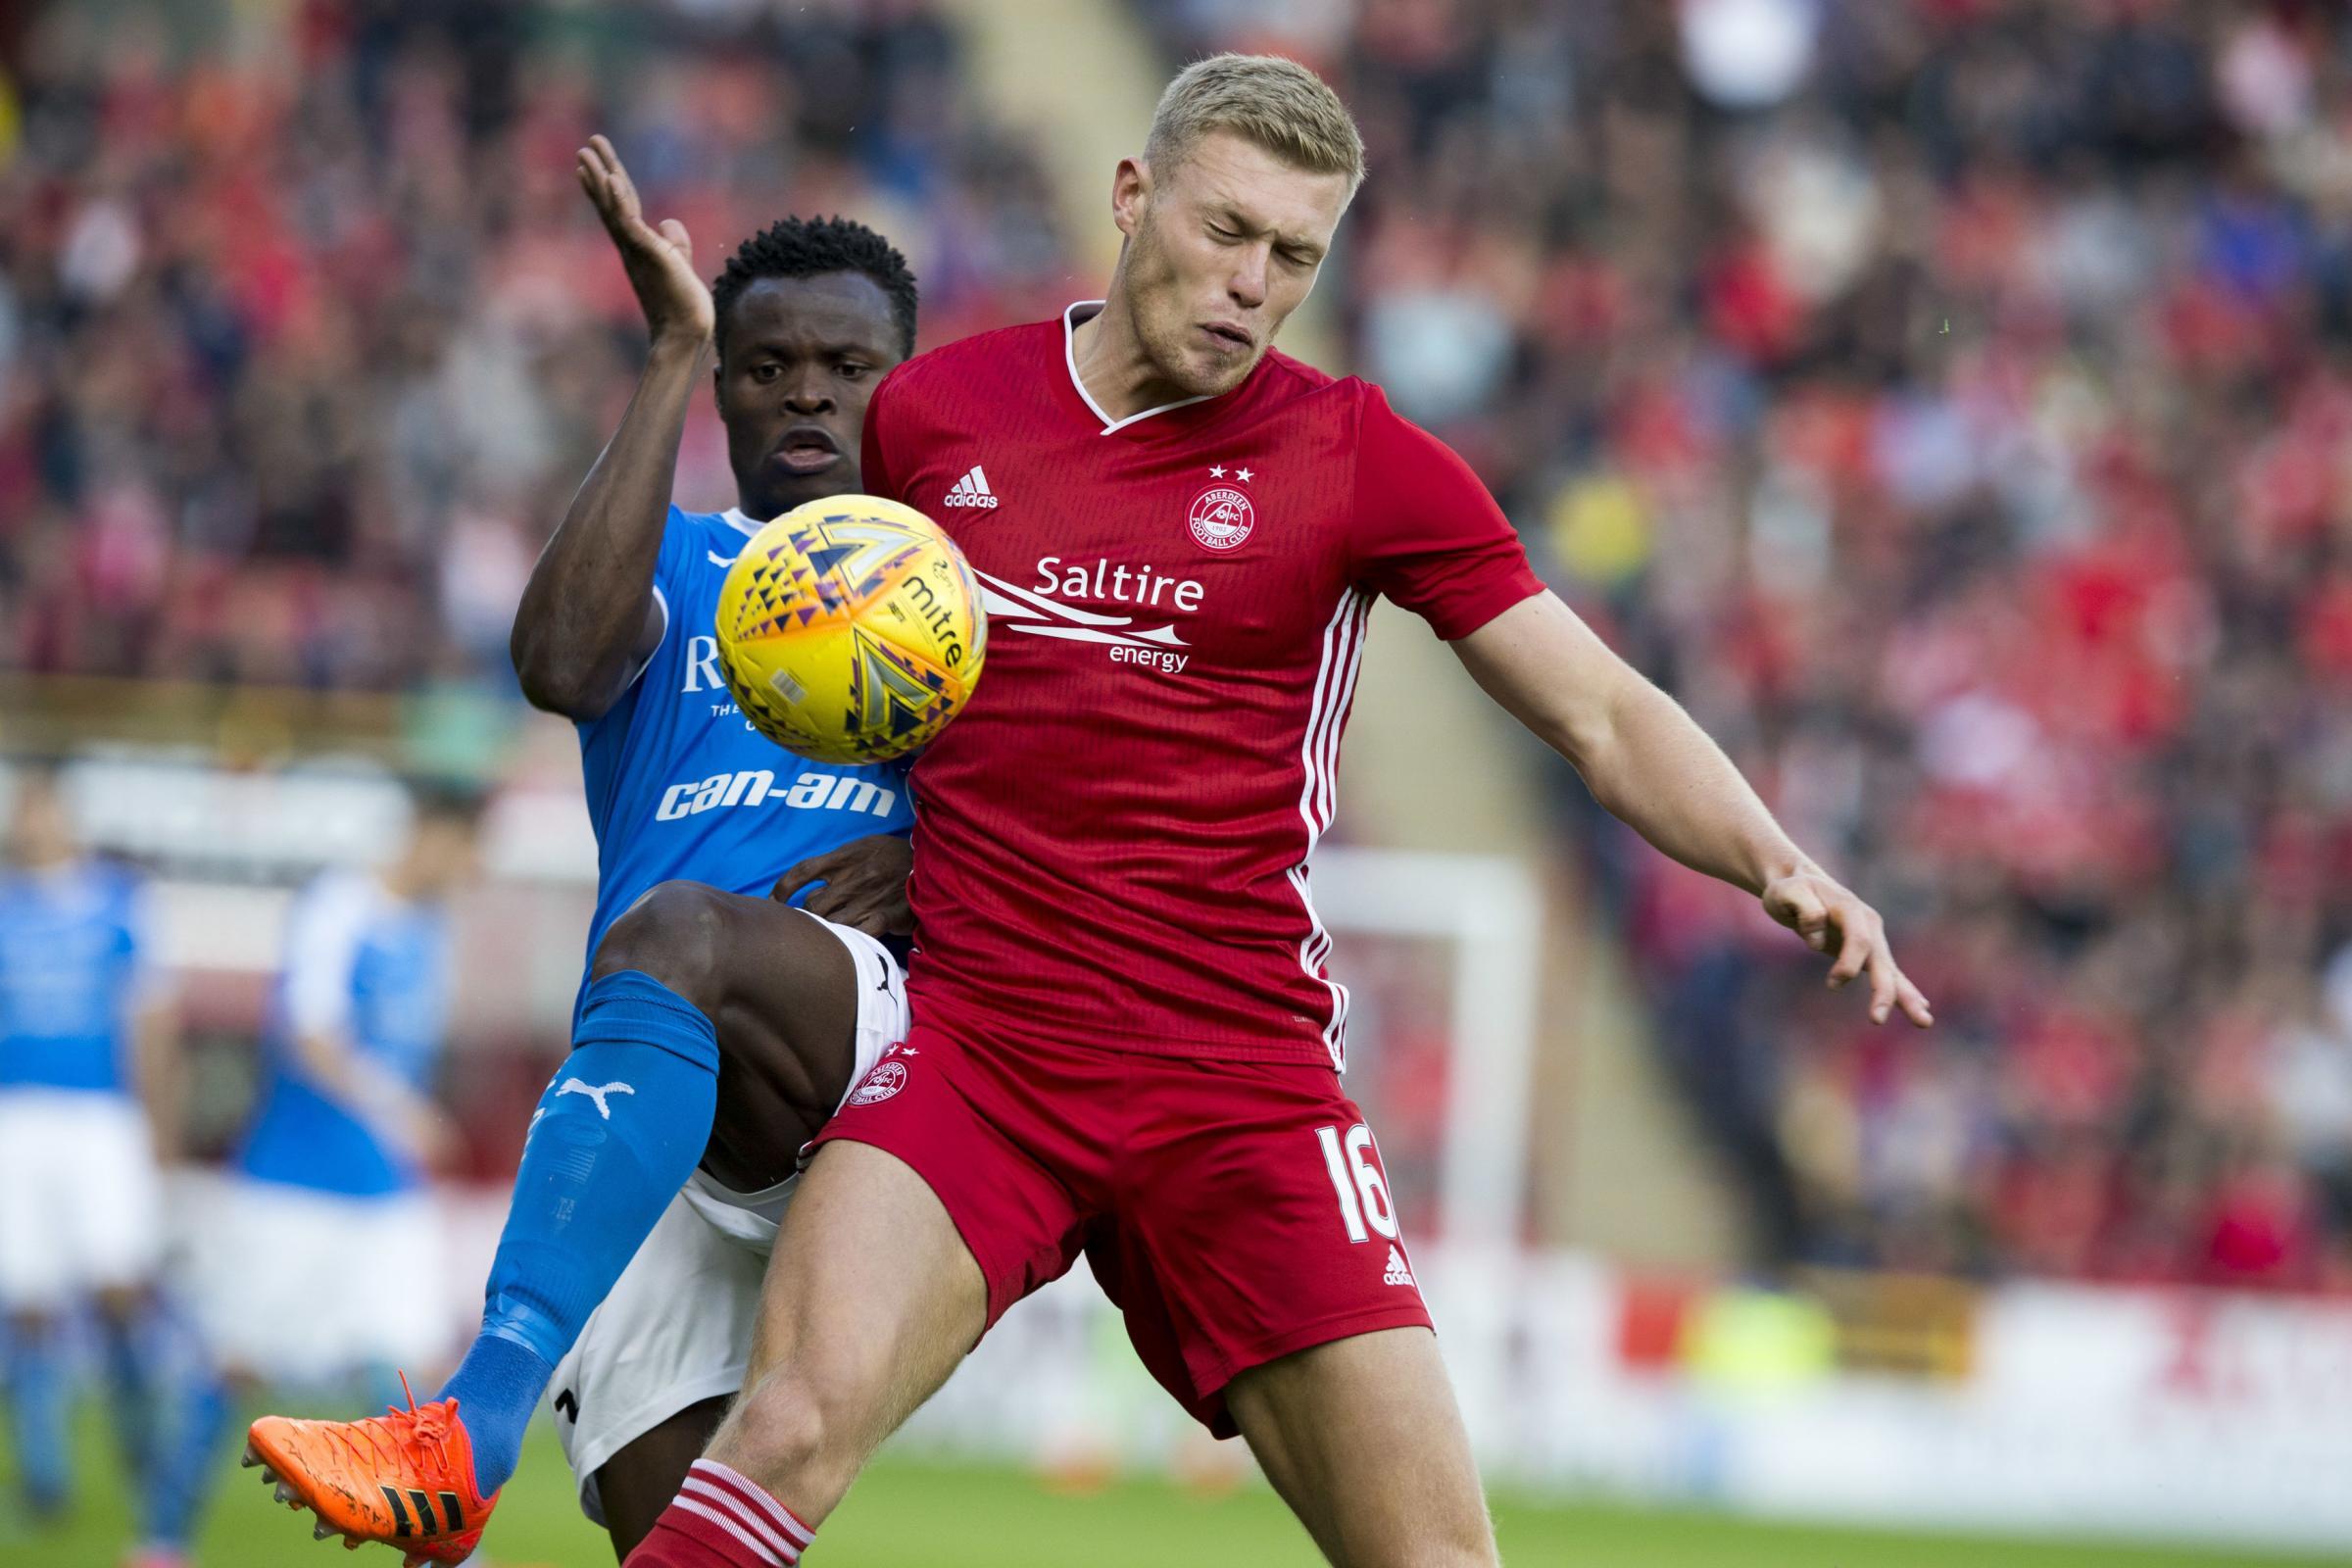 Chikhura goalkeeper warns Aberdeen of intense atmosphere